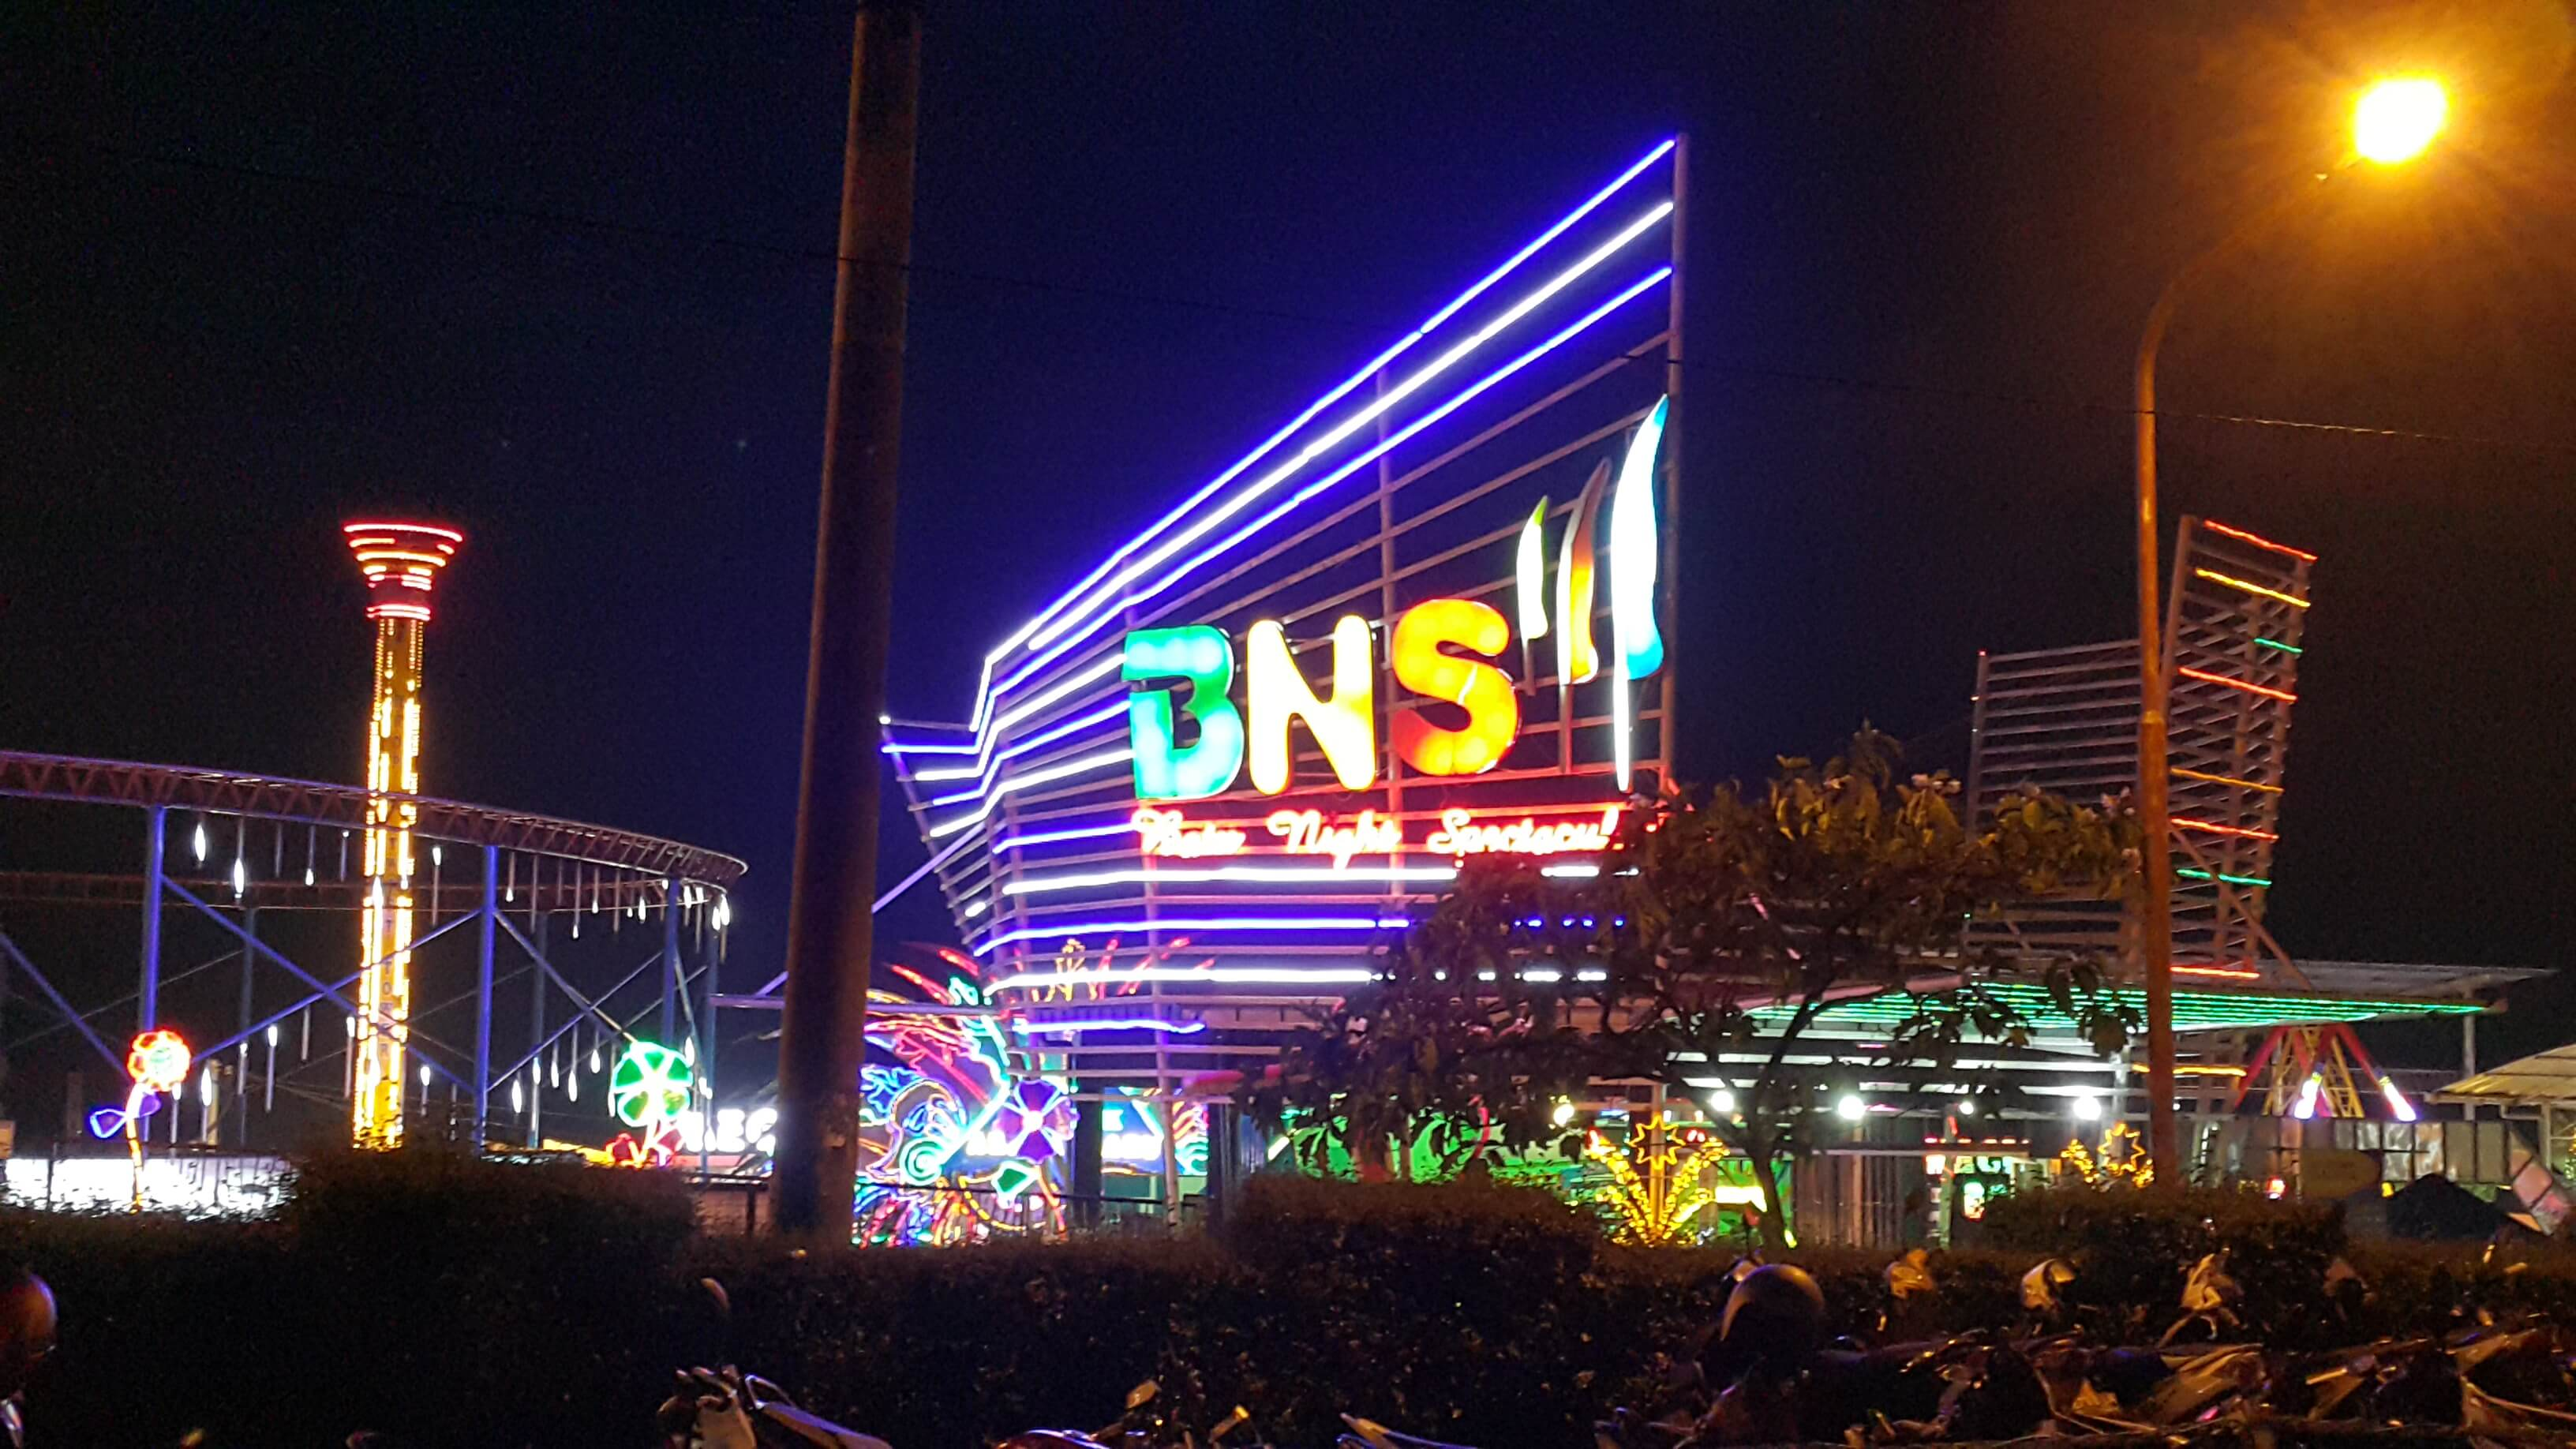 Indonesian theme park bns